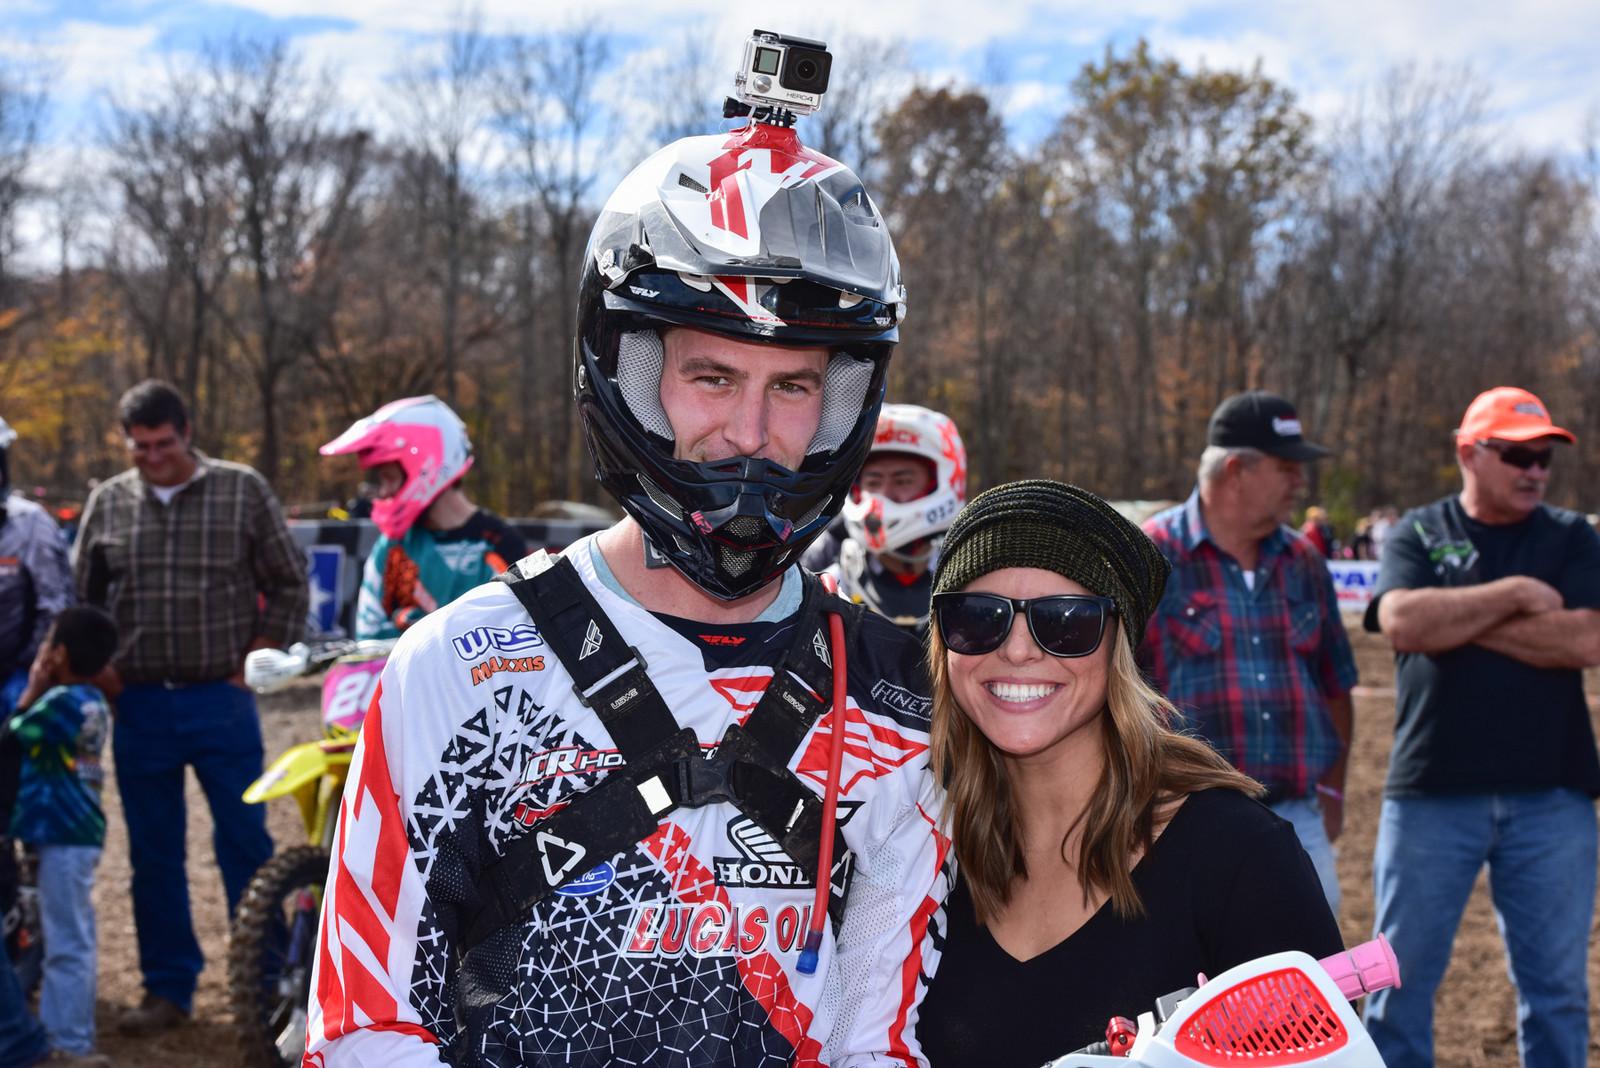 Chris Bach - Photo Blast: Ironman GNCC - Motocross Pictures - Vital MX